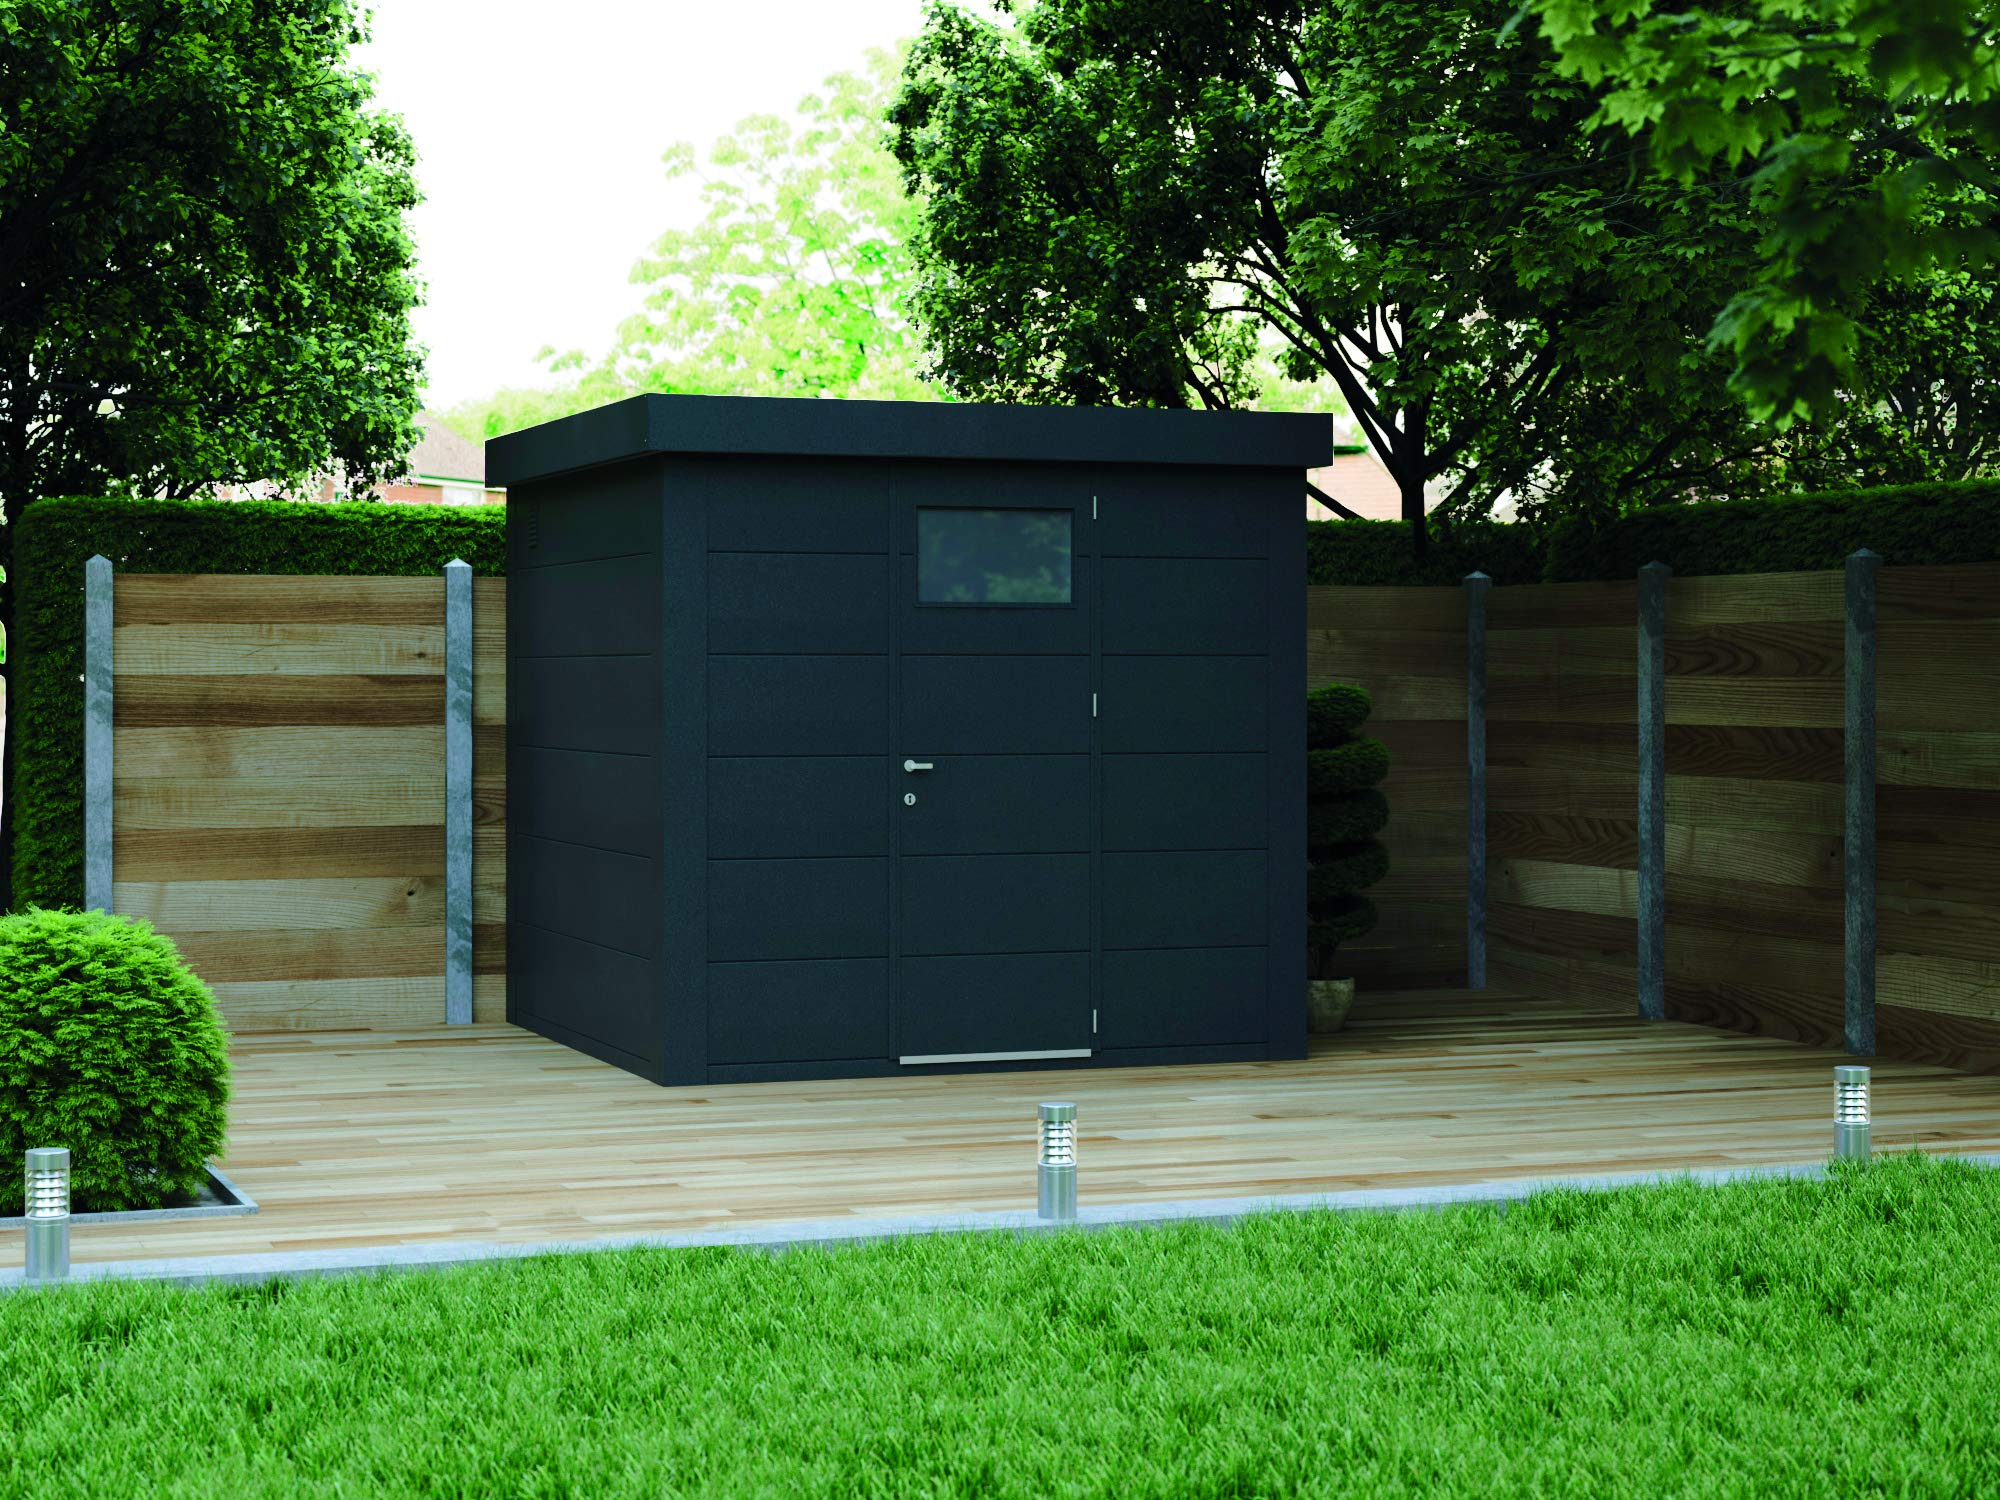 NOVO HABITAT Caseta de Jardin metálica NH4 | Antracita | 238 x 238: Amazon.es: Jardín